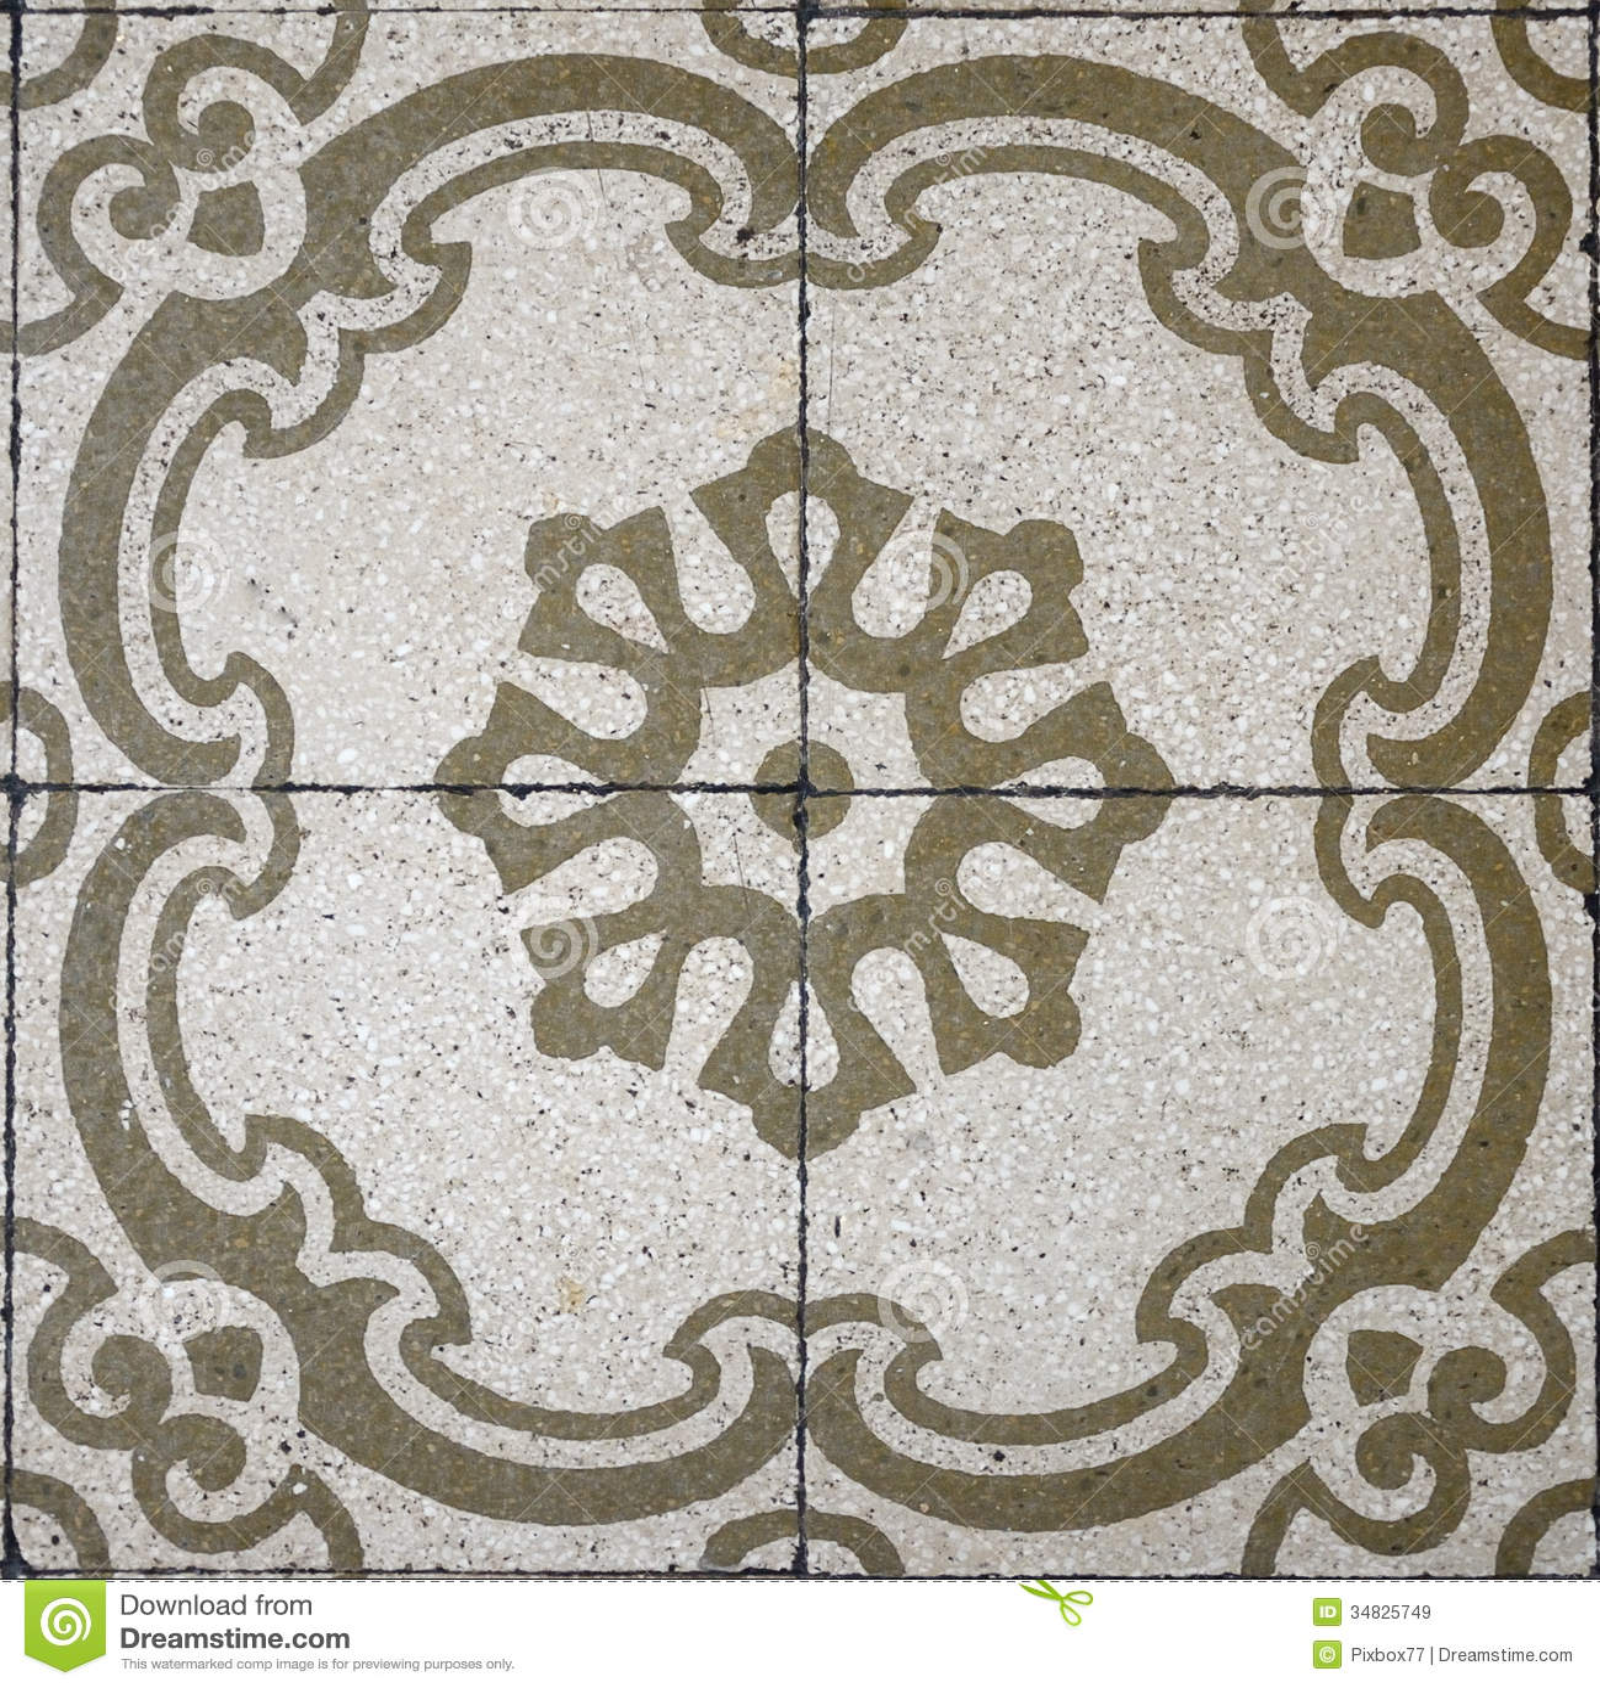 Vintage Tile Pattern Royalty Free Stock Images Image